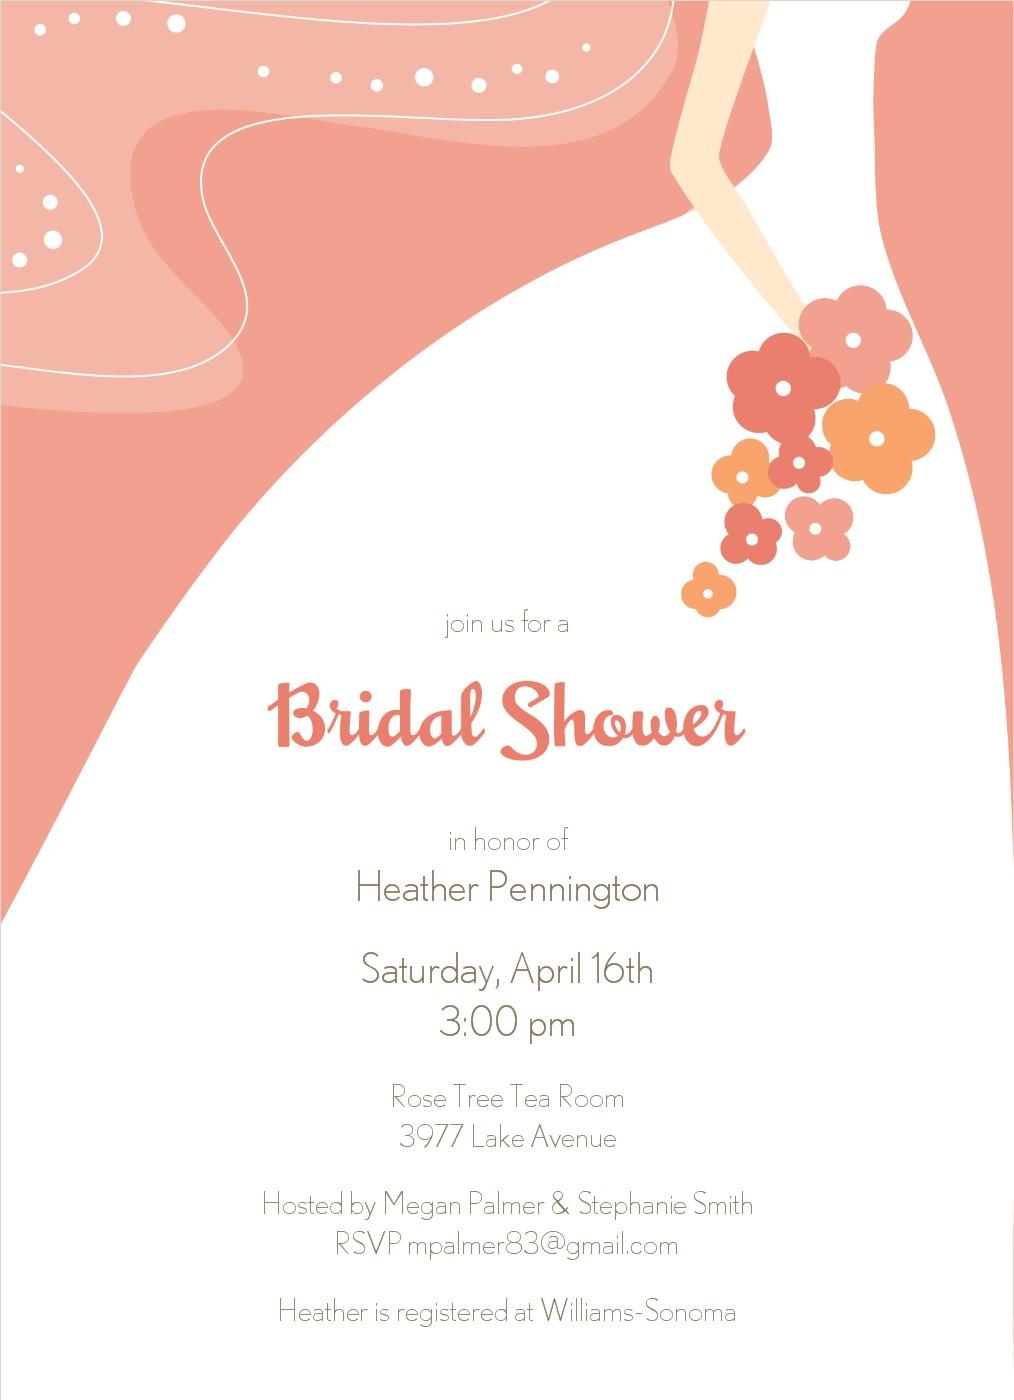 Free Bridal Shower Cliparts, Download Free Clip Art, Free Clip Art.